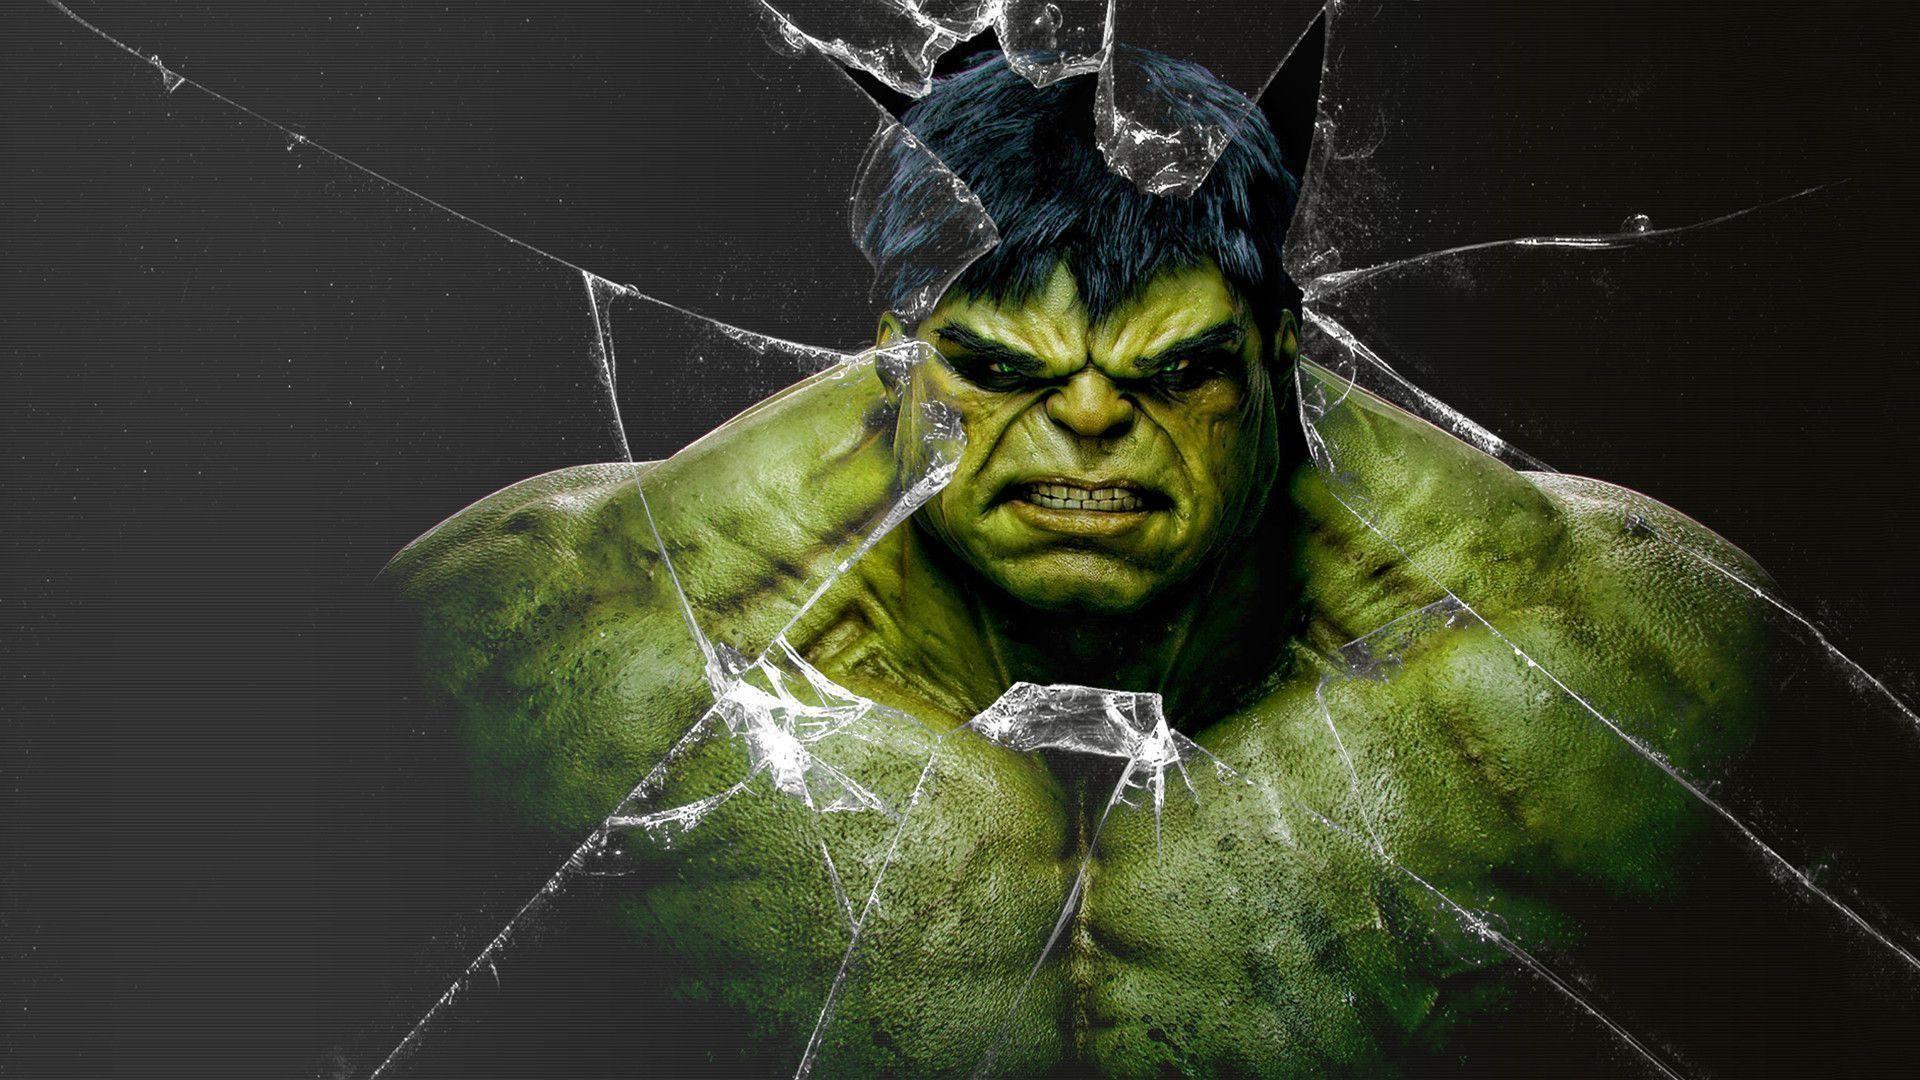 Res: 1920x1080, Hulk Wallpapers 2015 - Wallpaper Cave